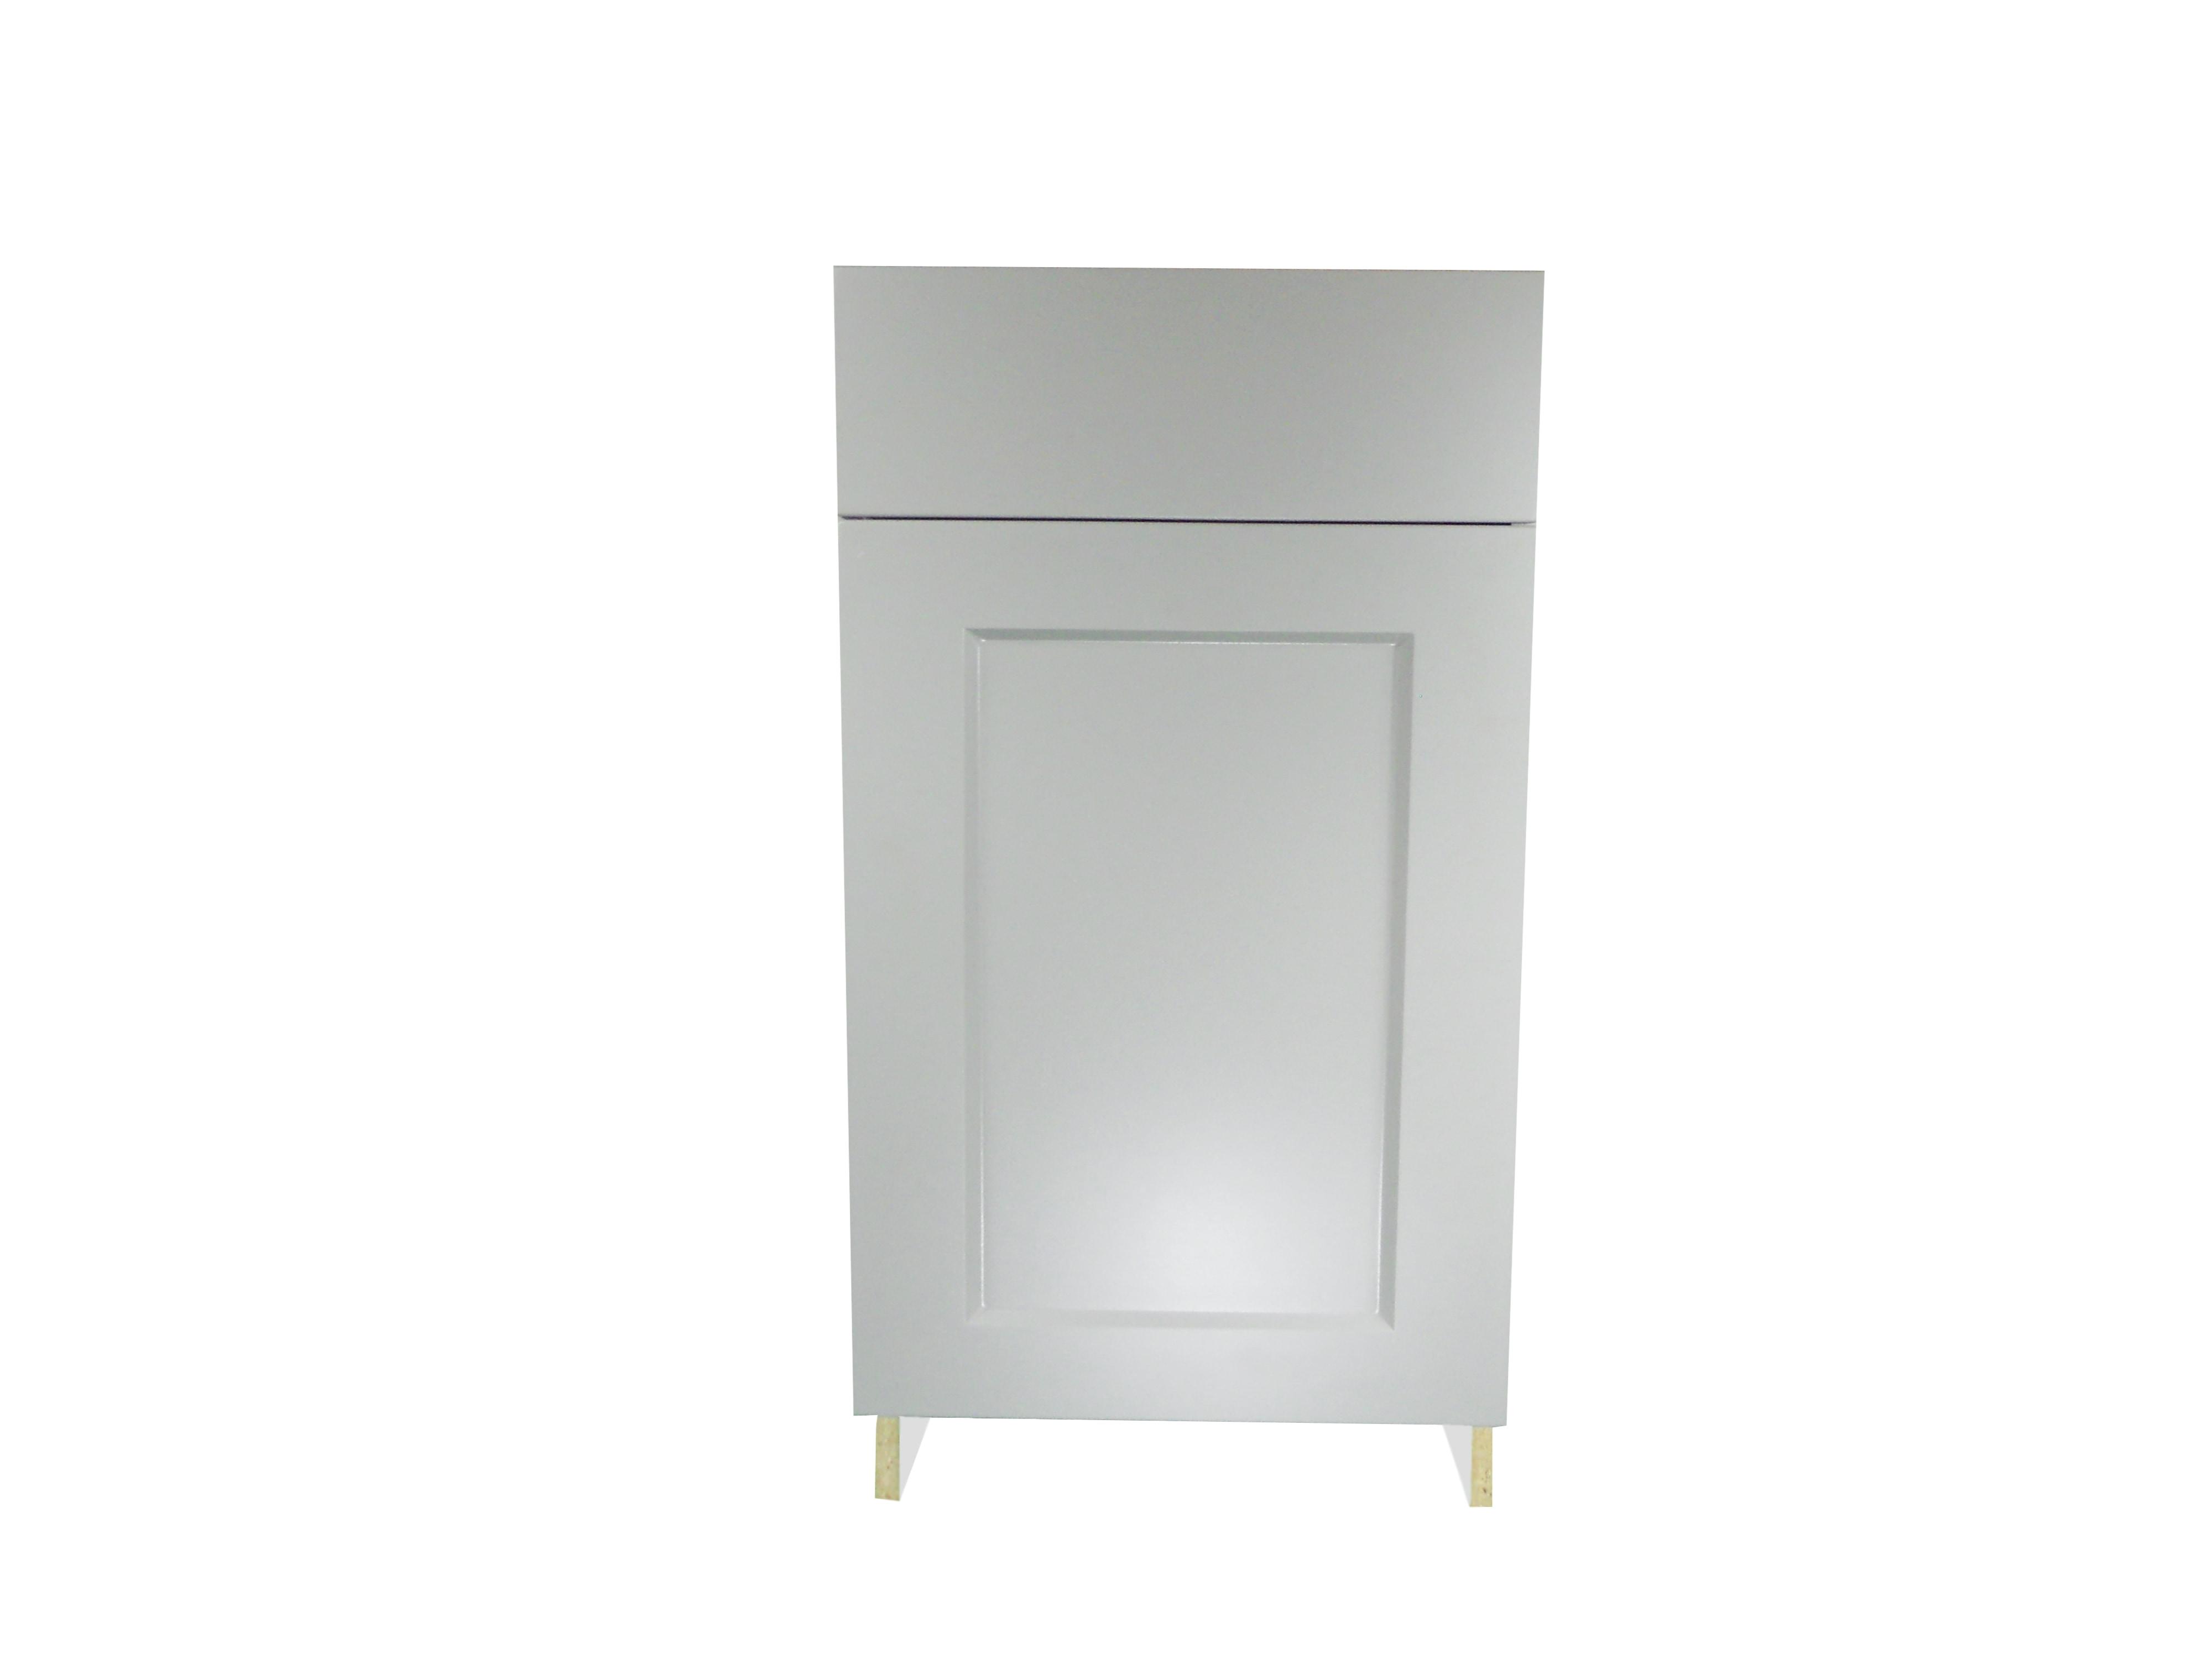 Base Cabinet with Drawer/Door / Whistler Grey / Flat Panel Grey / 21 Whistler Grey 0